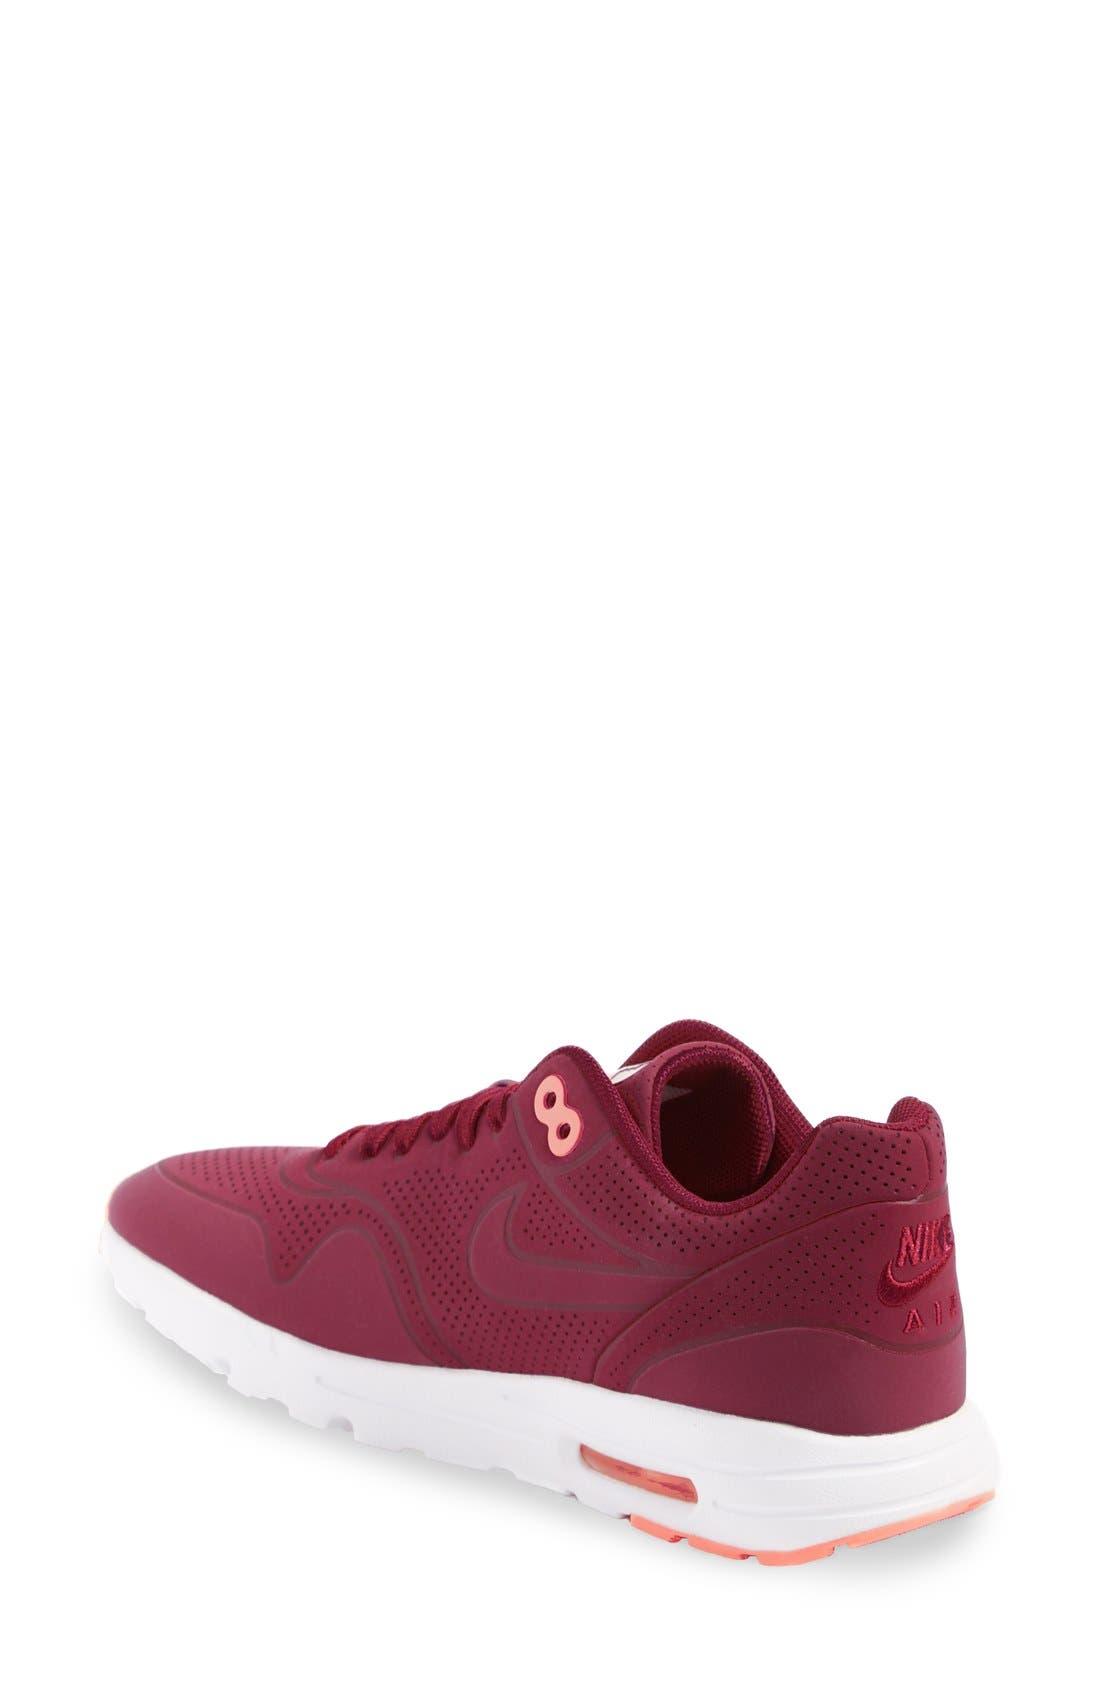 ,                             'Air Max 1 - Ultra Moire' Sneaker,                             Alternate thumbnail 106, color,                             602